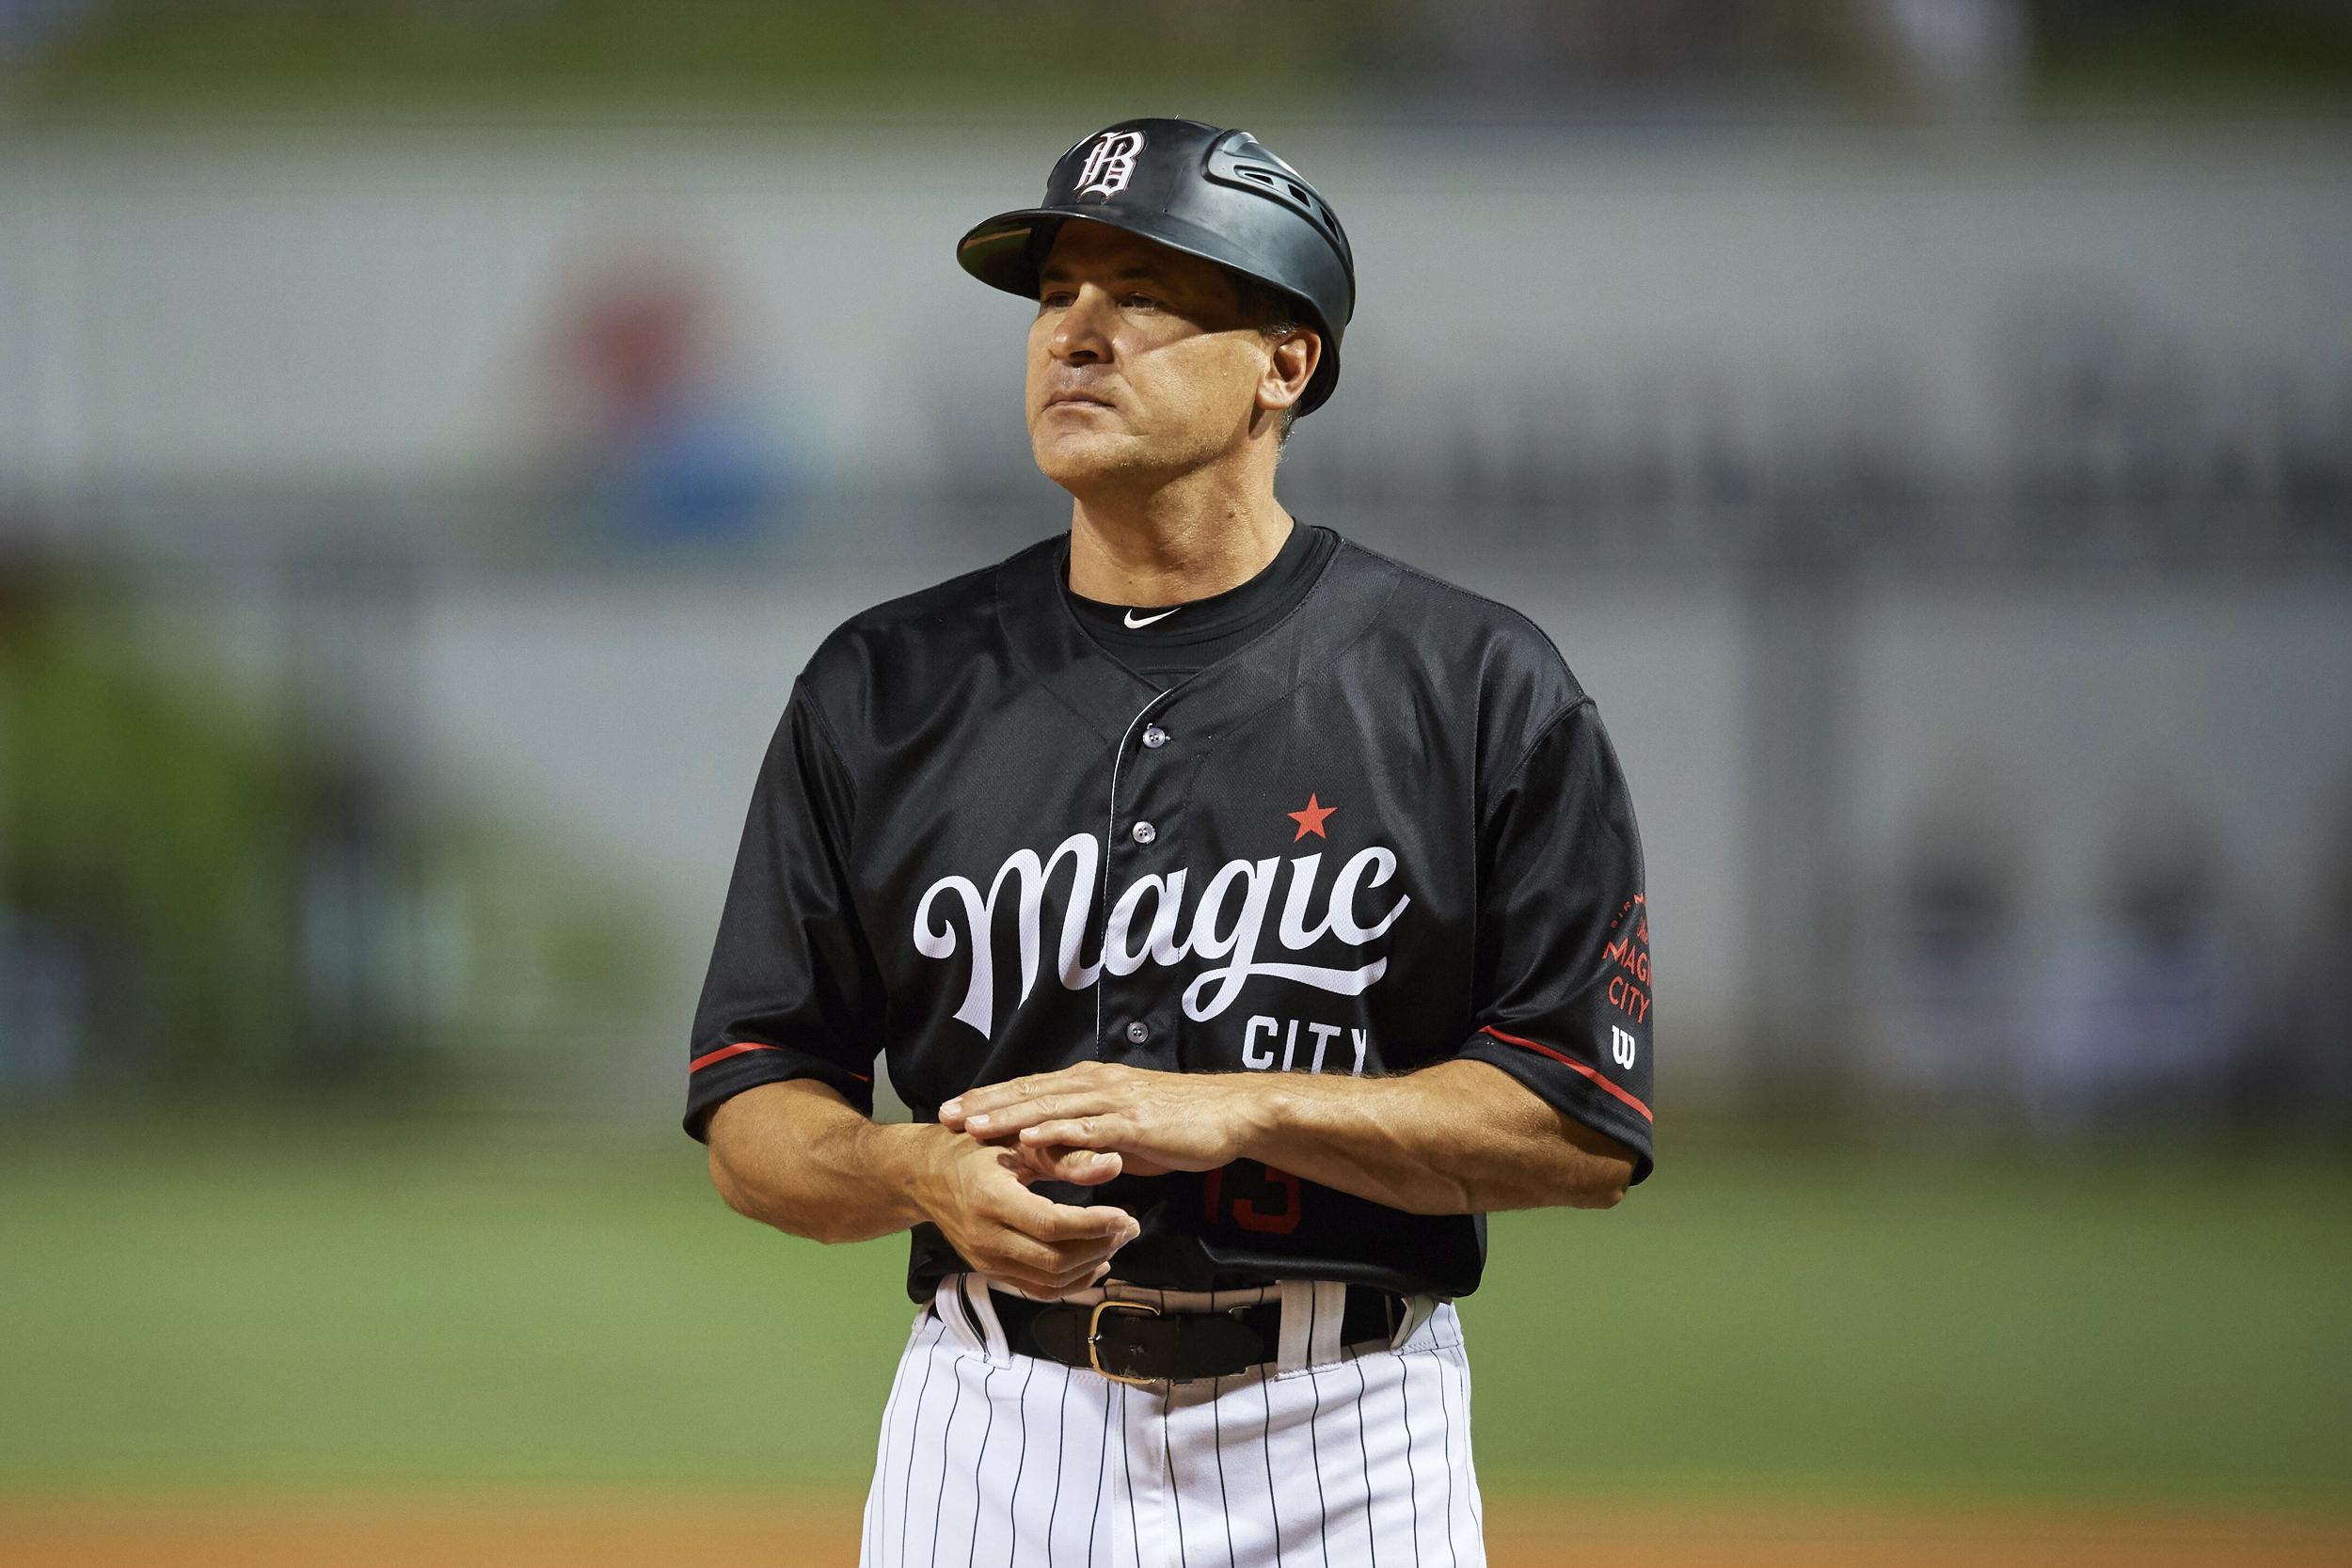 Former MLB star Omar Vizquel accused of sexually harassing batboy